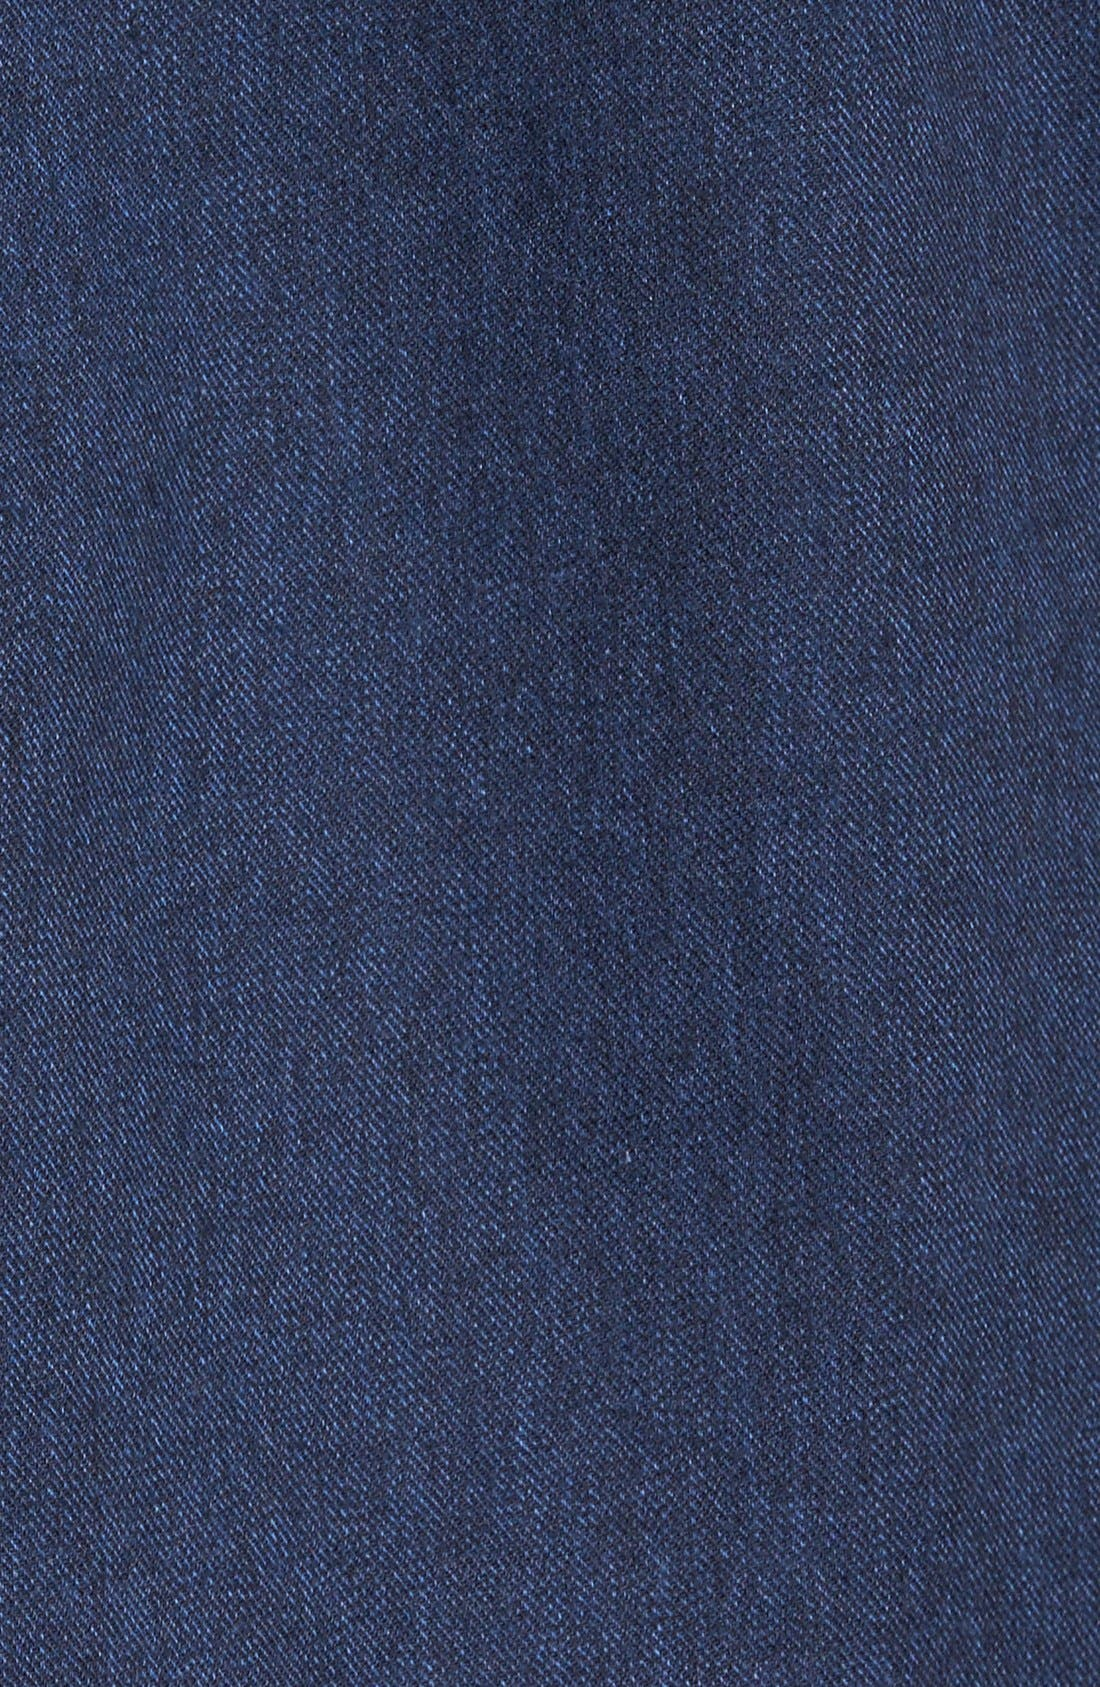 'Sinclair' Trim Fit Brushed Twill Sport Shirt,                             Alternate thumbnail 5, color,                             Indigo